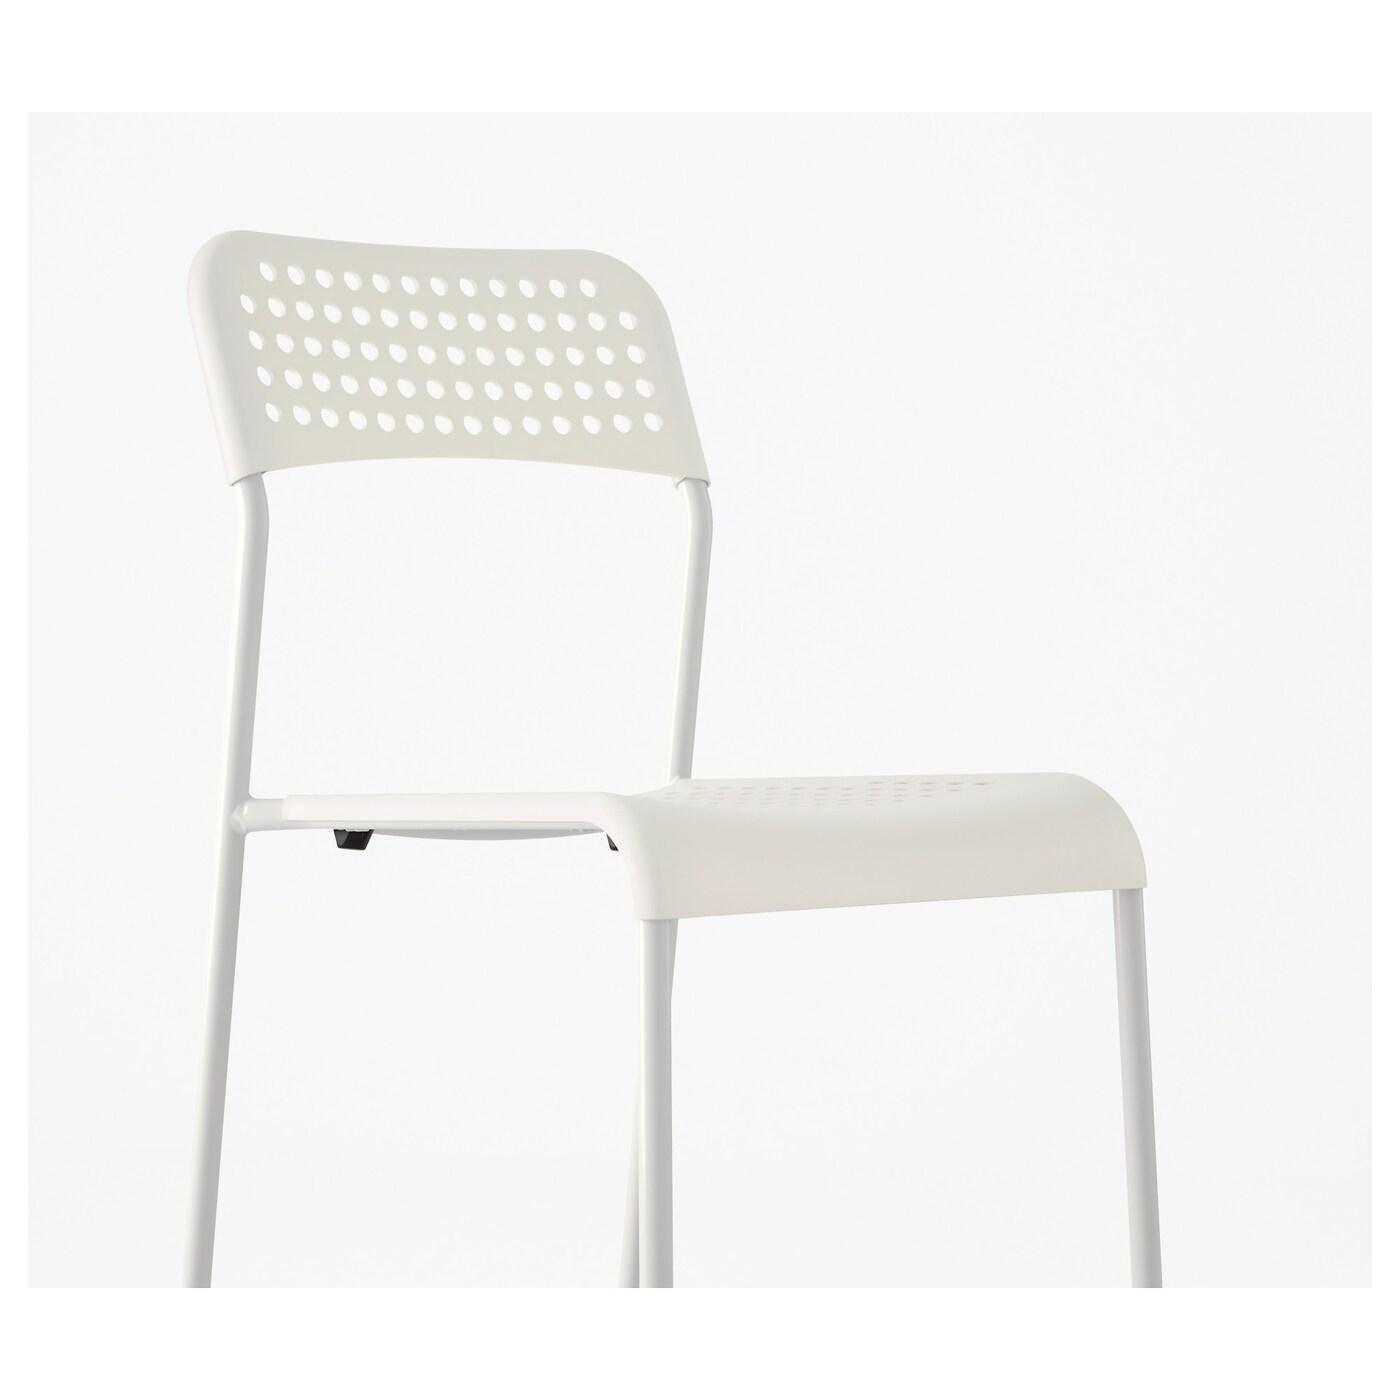 ADDE Stuhl, weiß   IKEA Schweiz